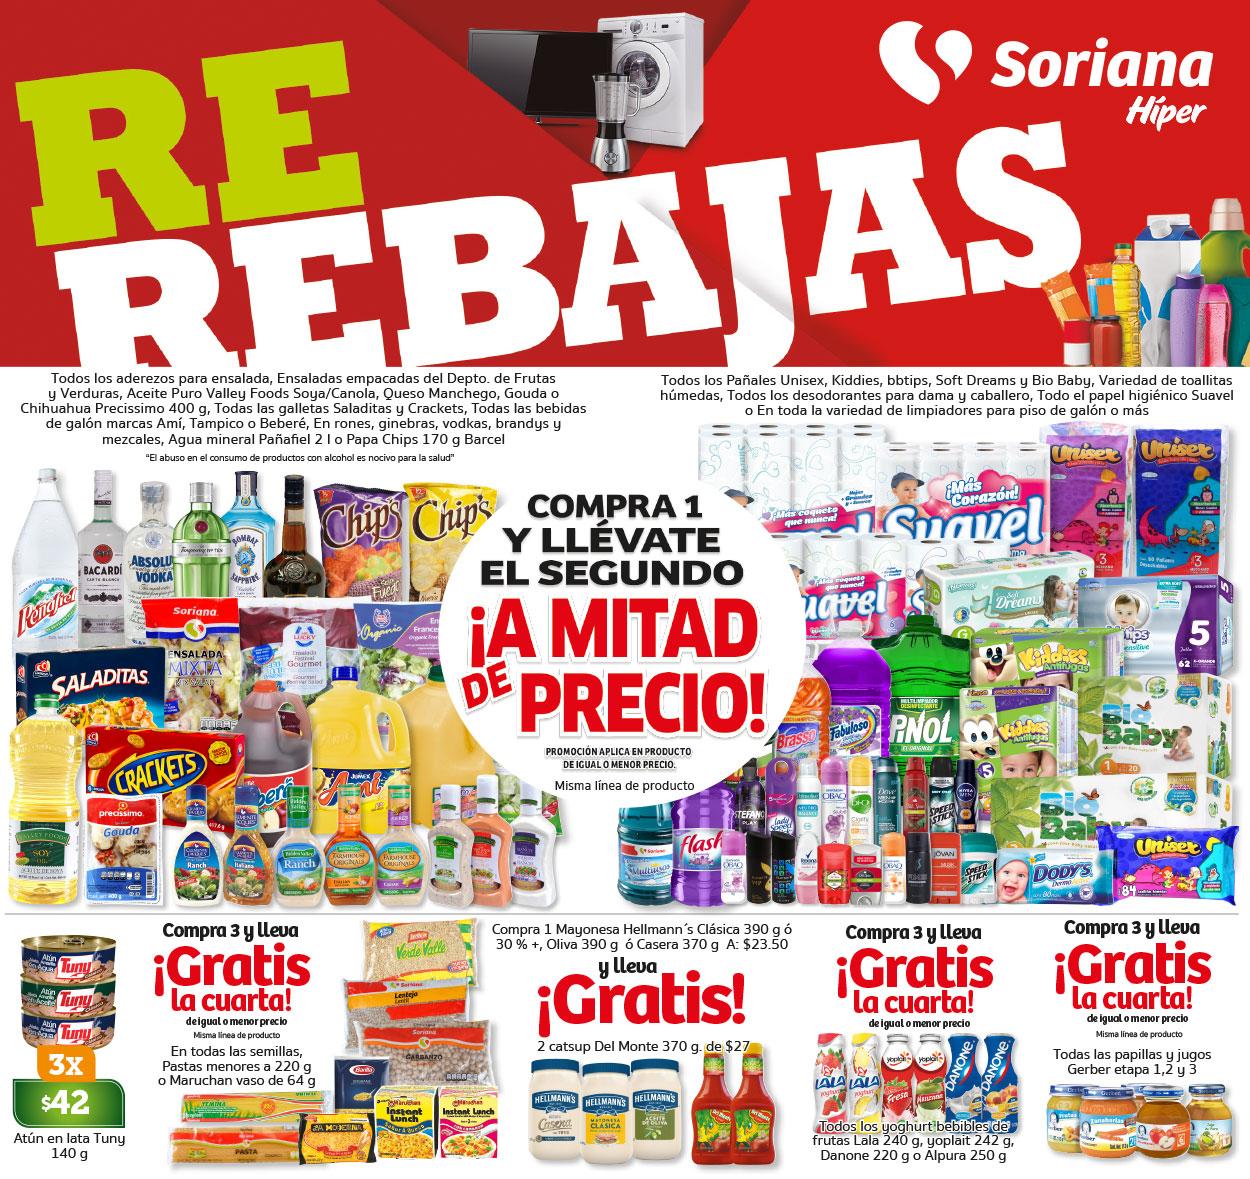 Soriana Híper y Súper: Ofertas de Fin de Semana